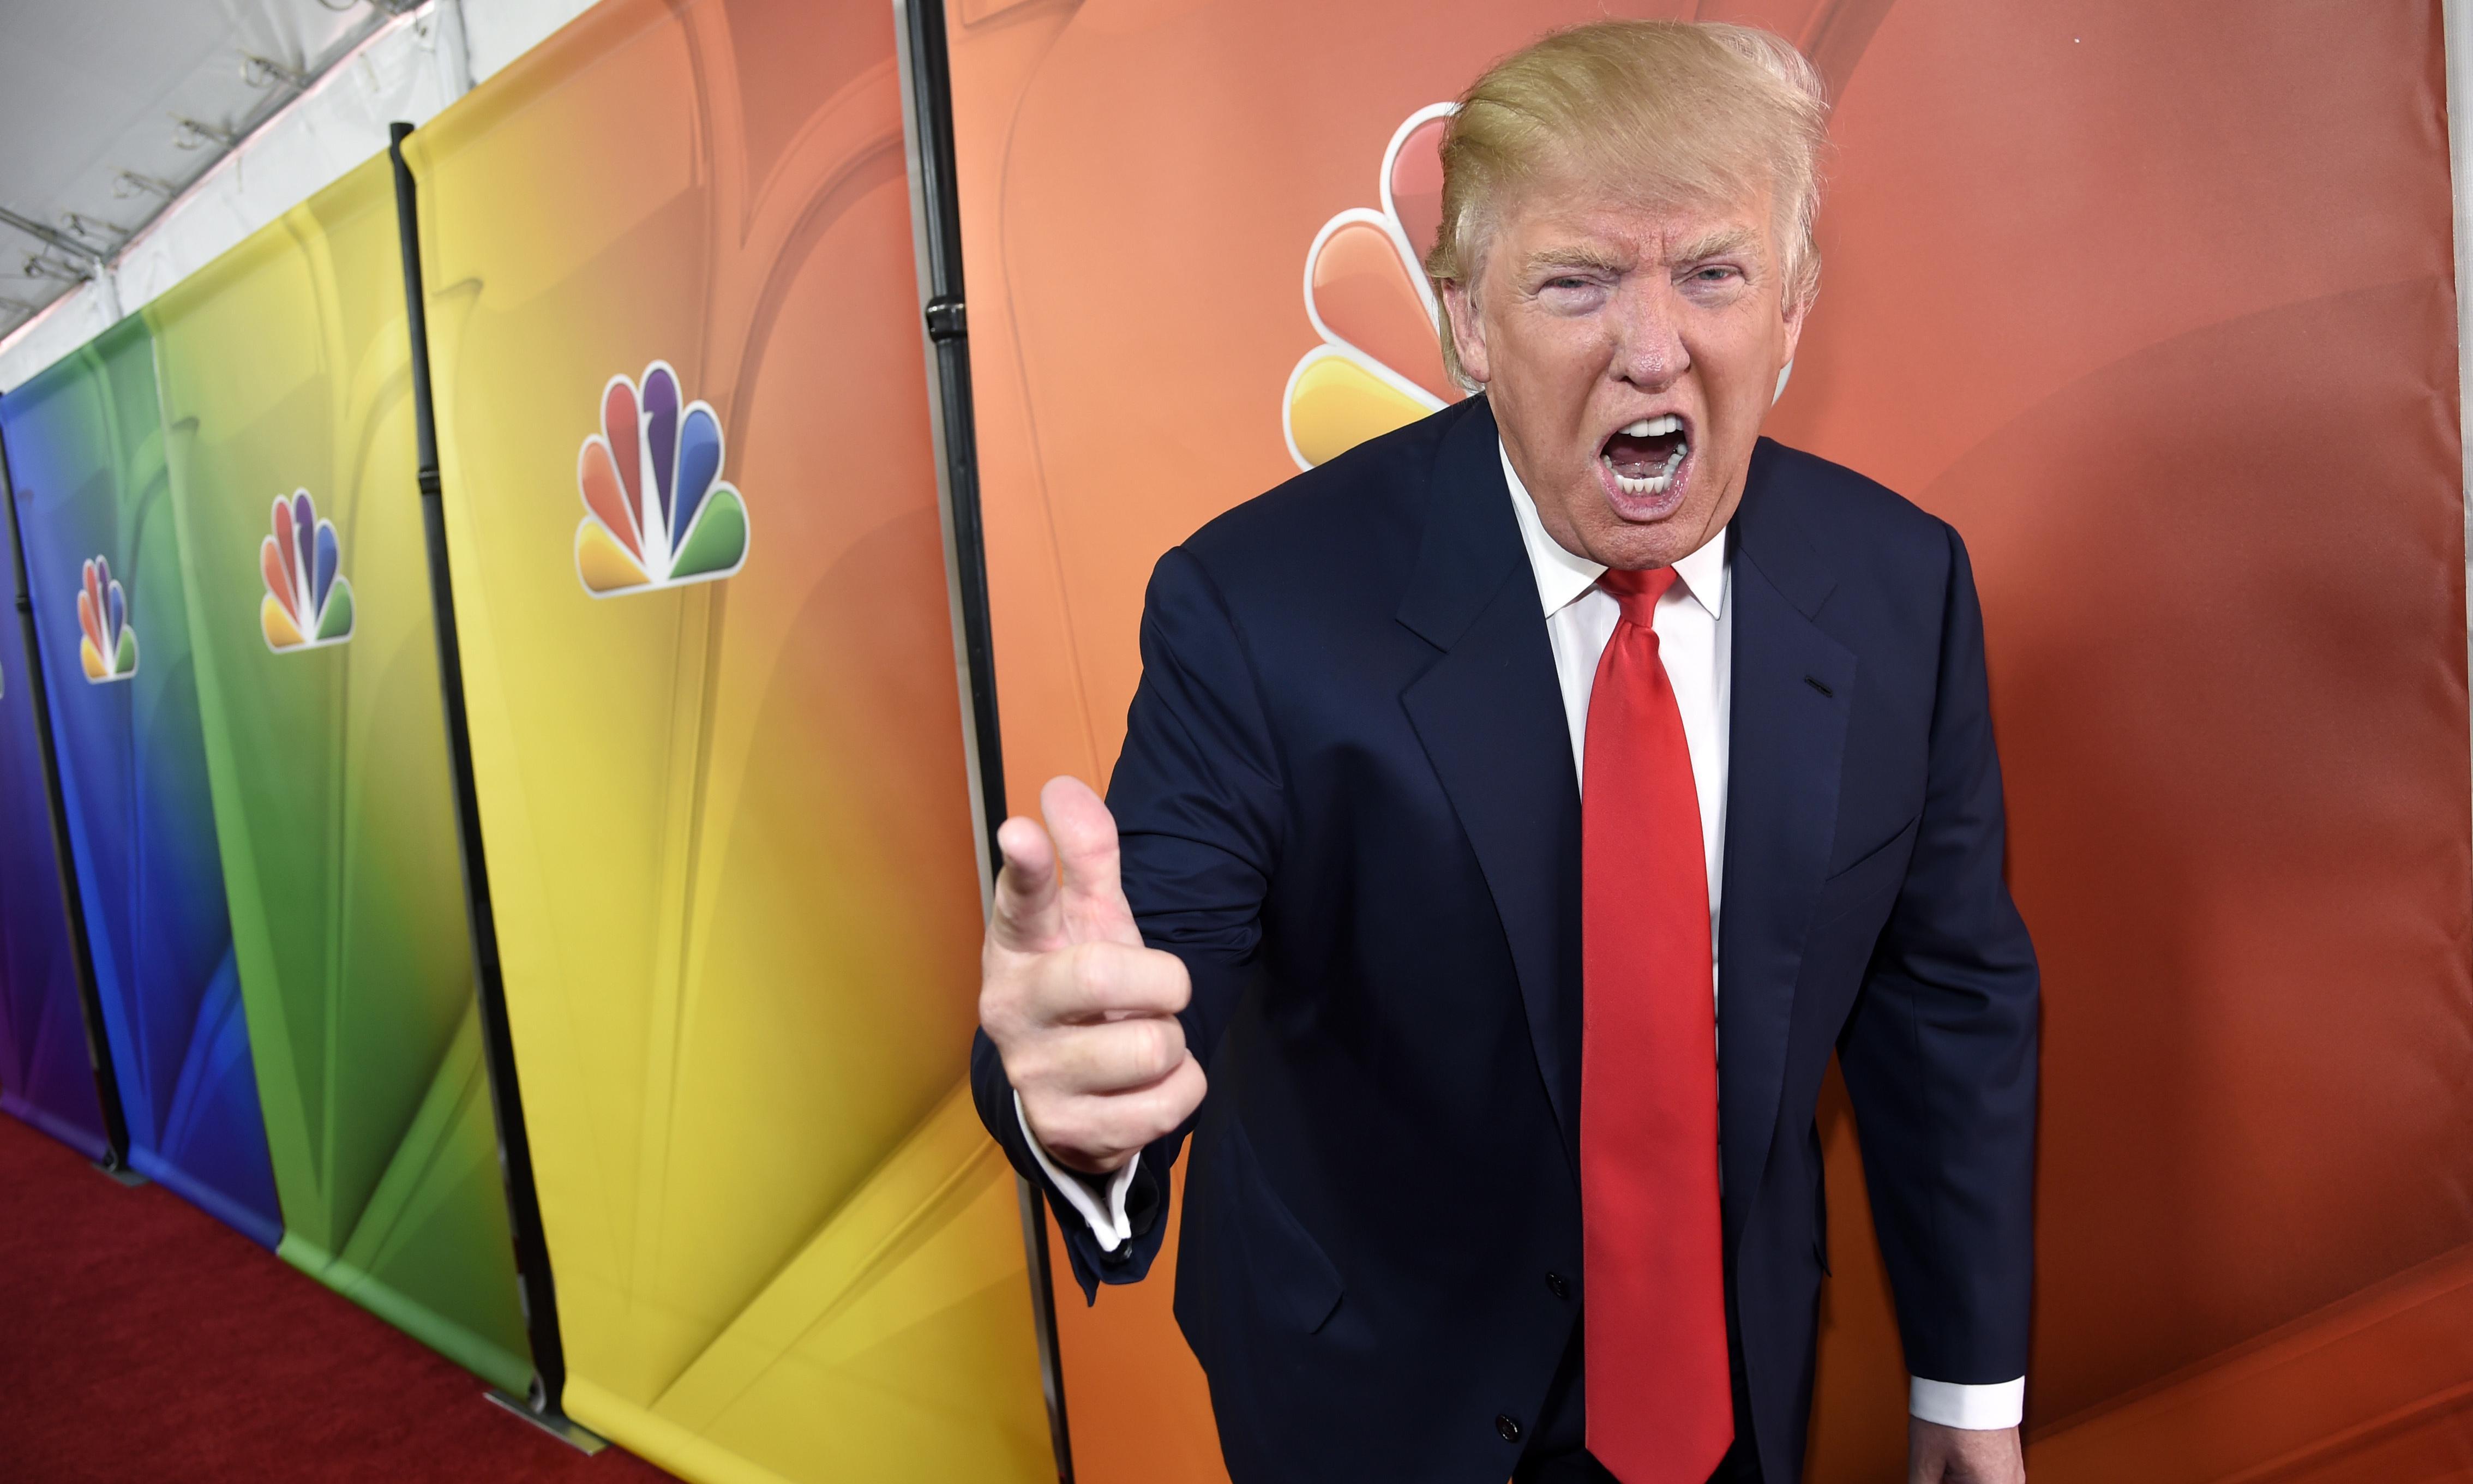 'A brutal dinner': celebrities talk about meeting Donald Trump